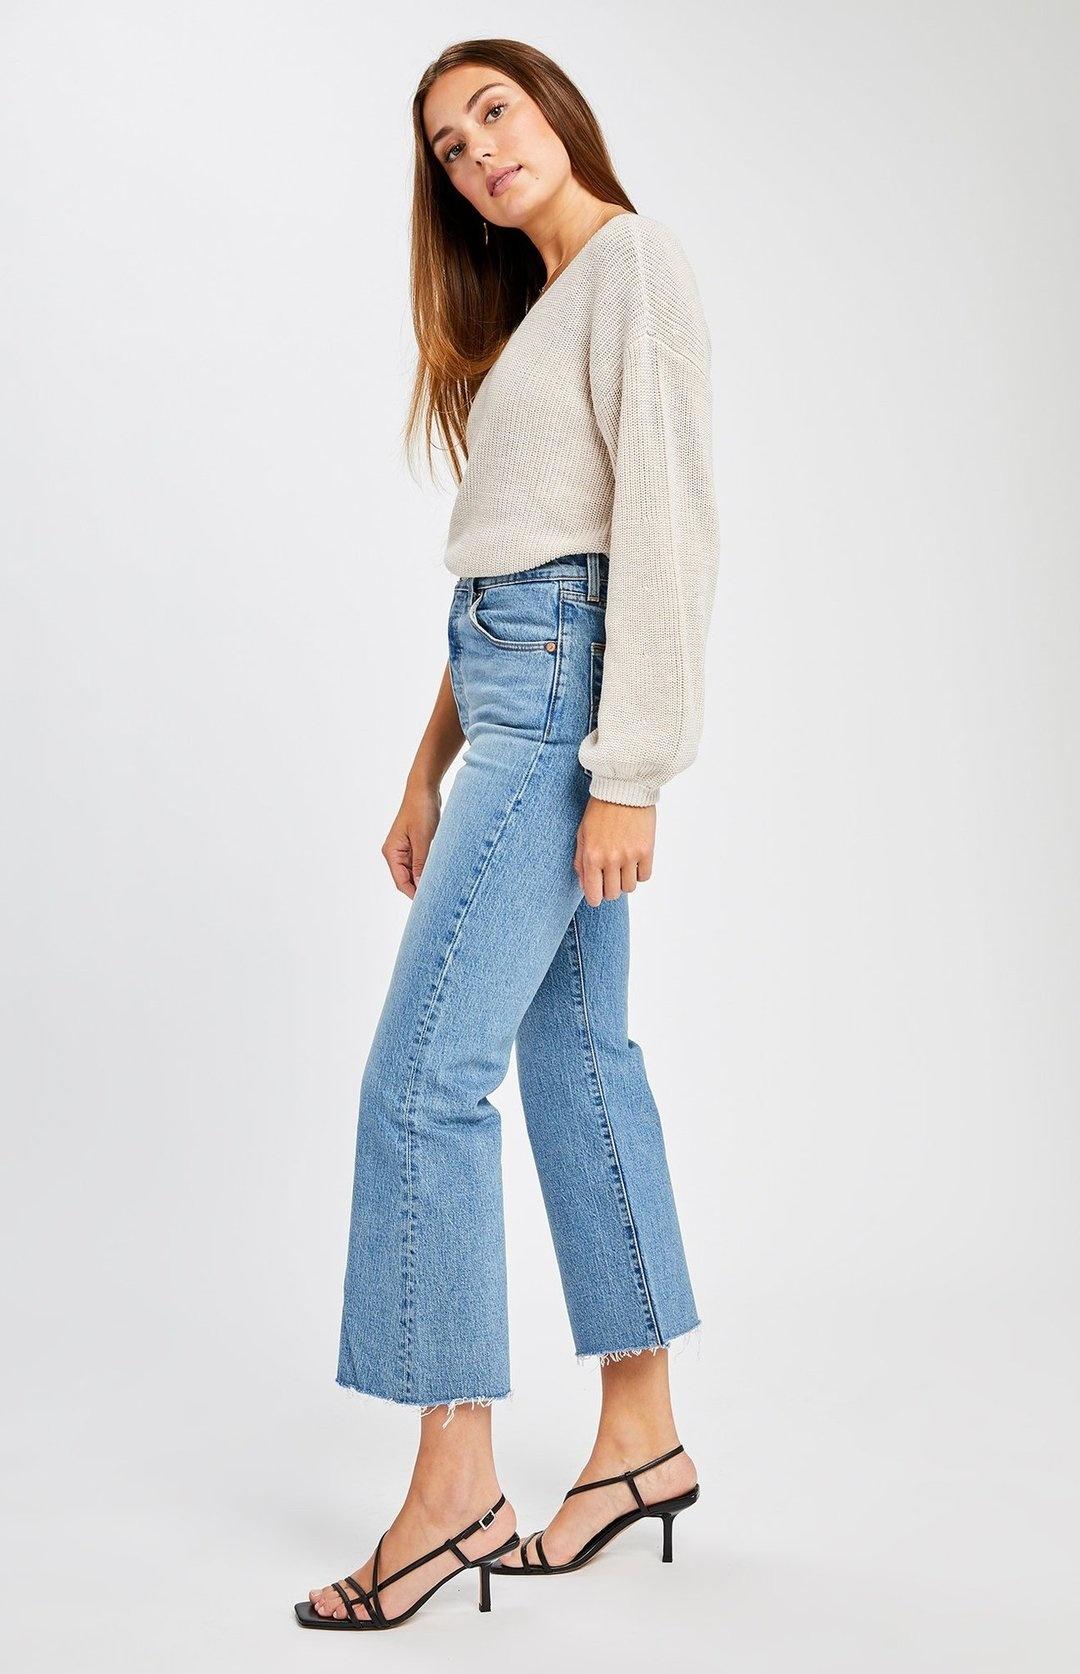 Gentlefawn Tundra Sweater